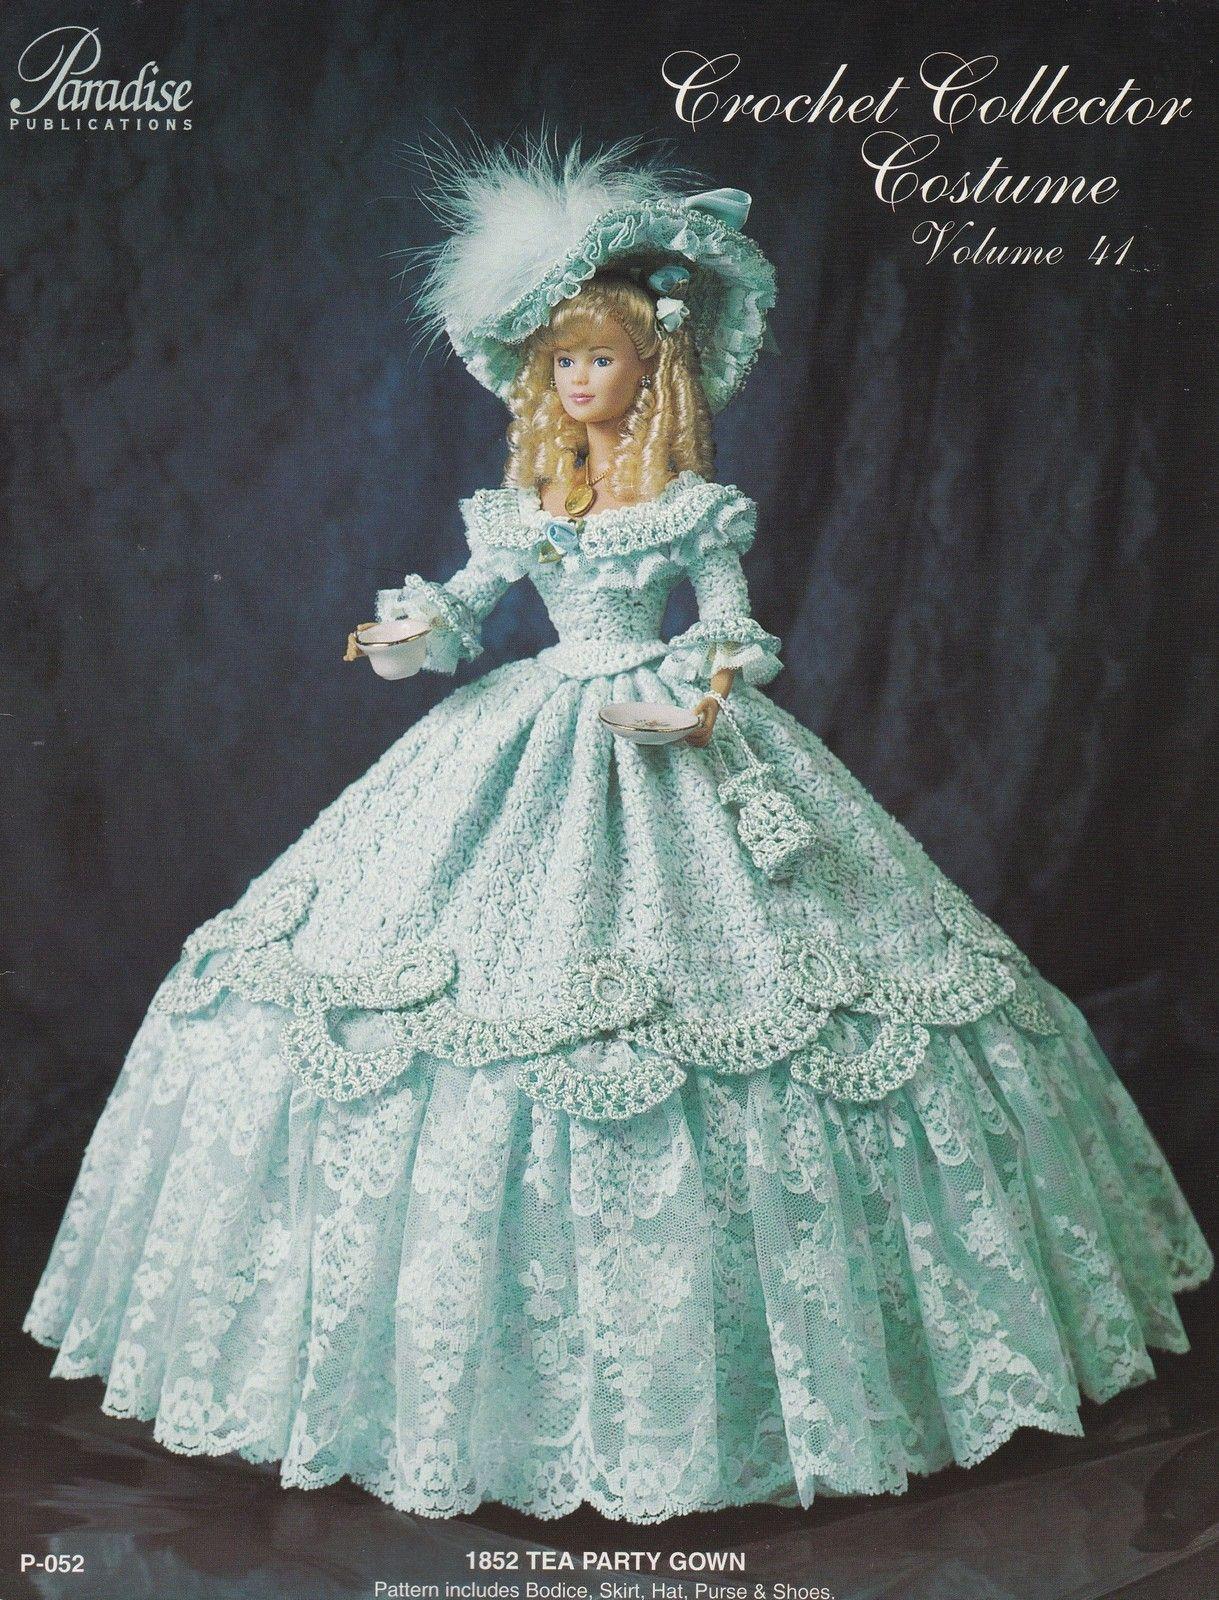 1901 Wedding Reception Frock for Barbie Paradise vol 11 Crochet PATTERN NEW